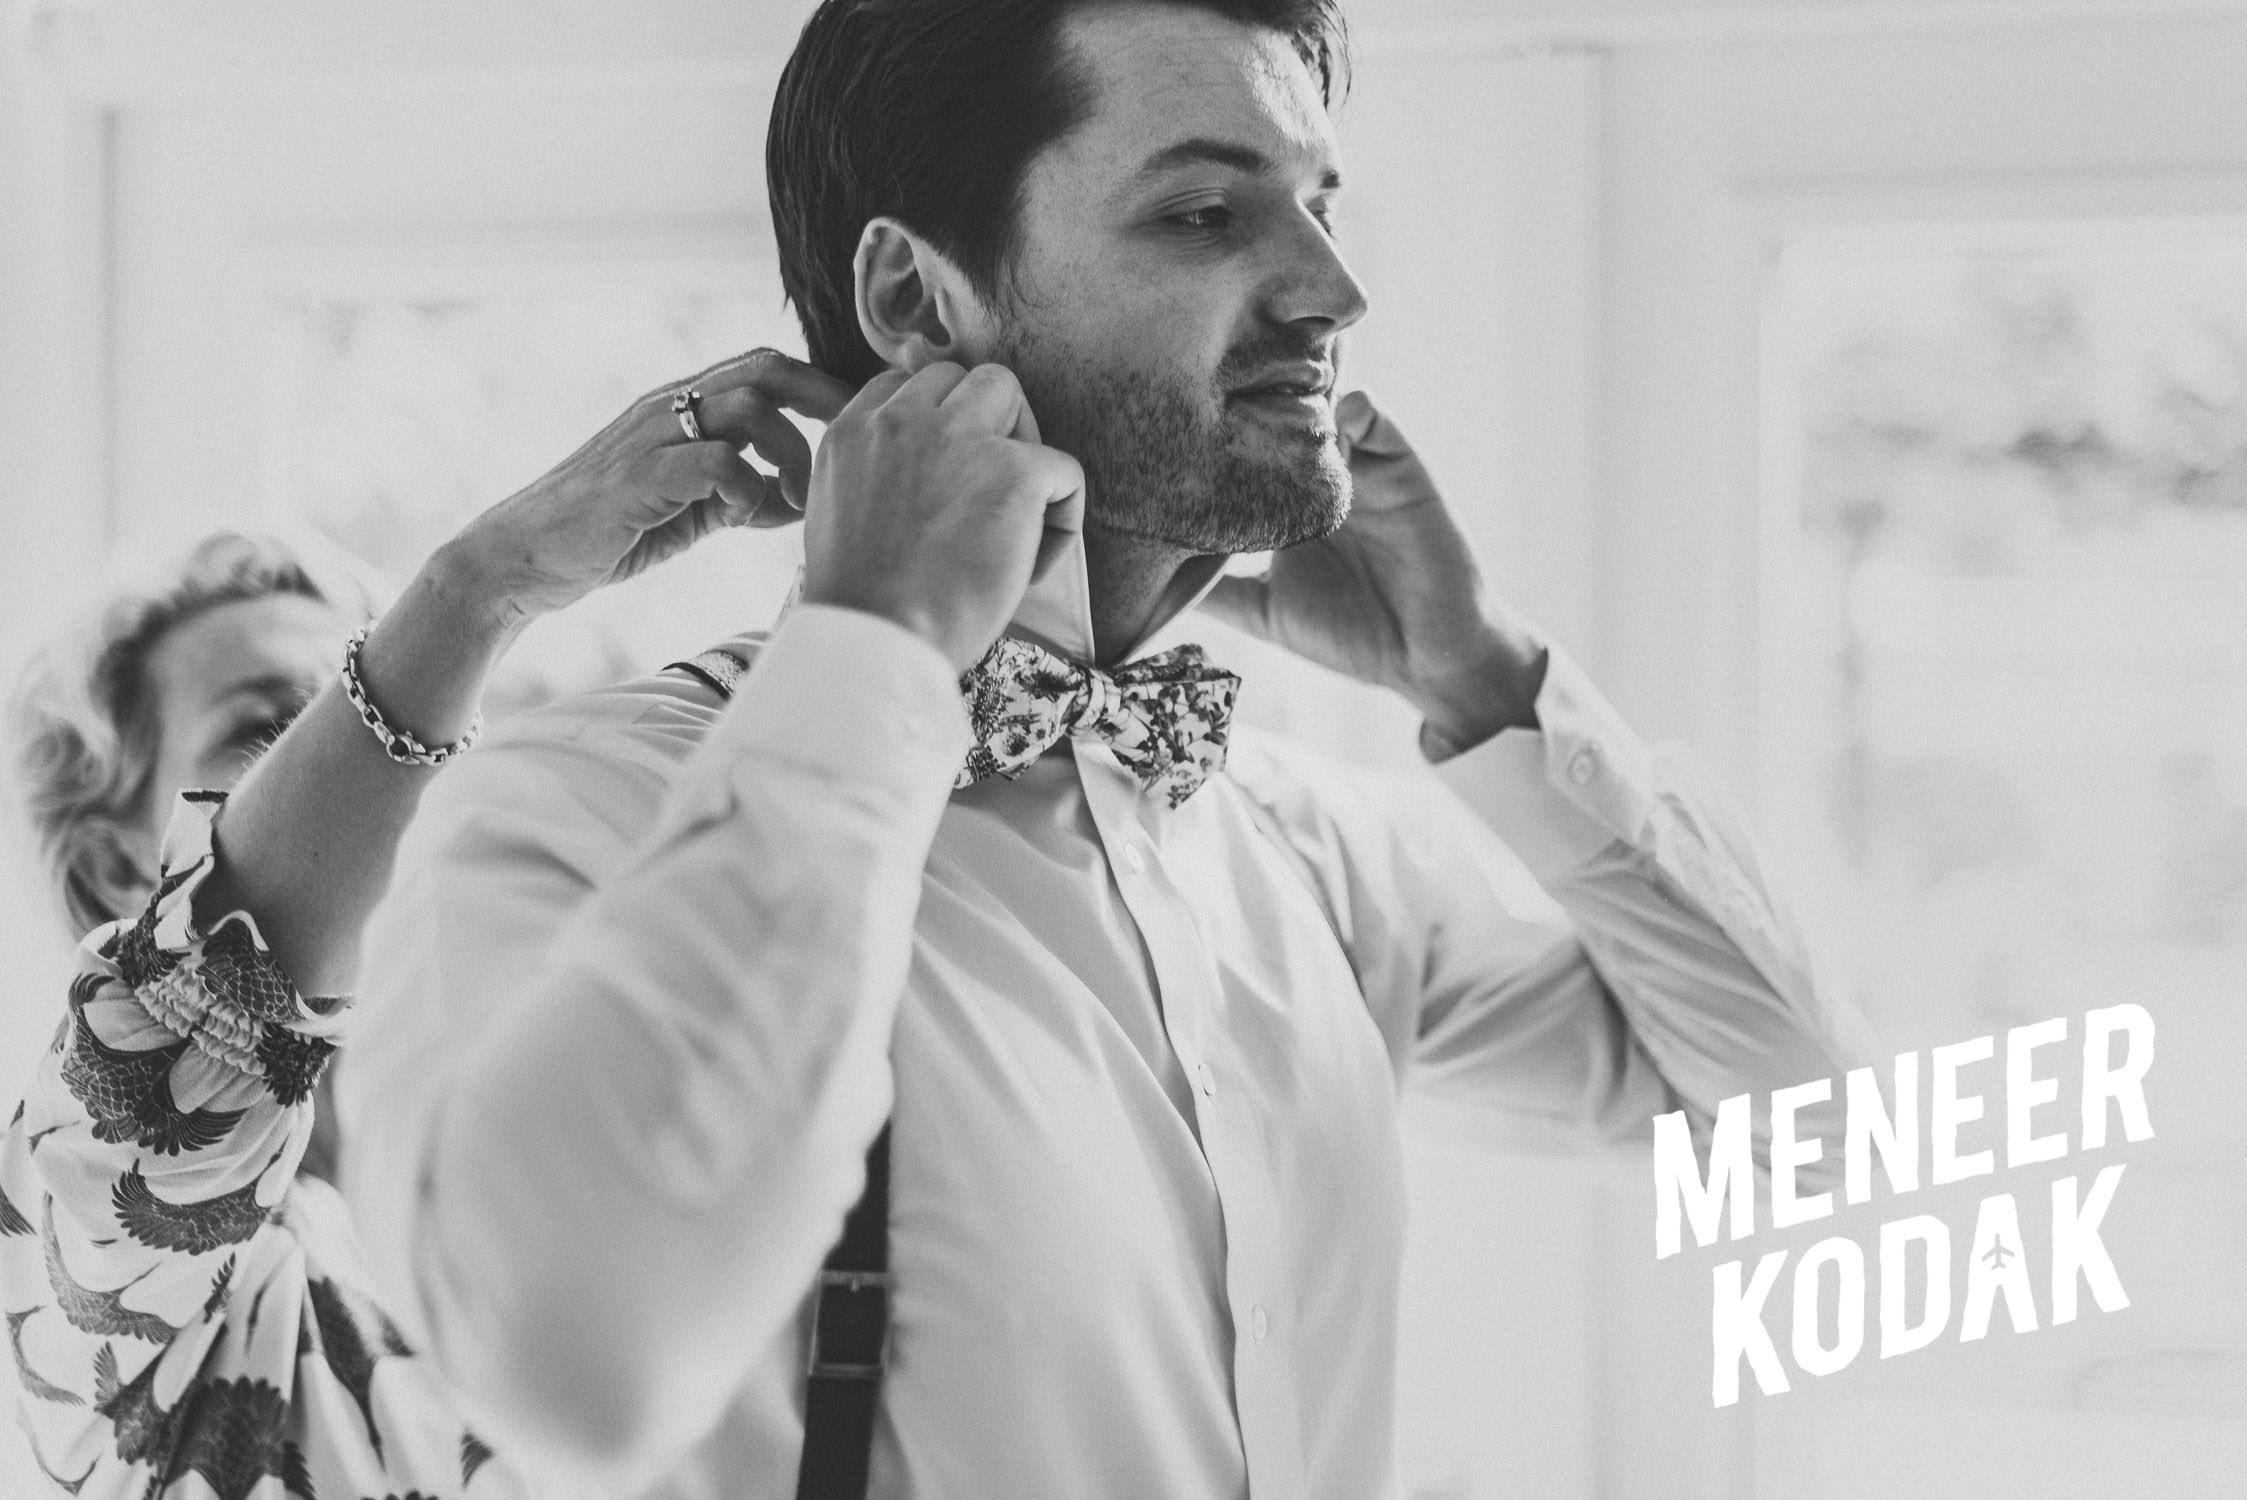 Meneer Kodak - Trouwreportage - Breda - E&M-060.jpg